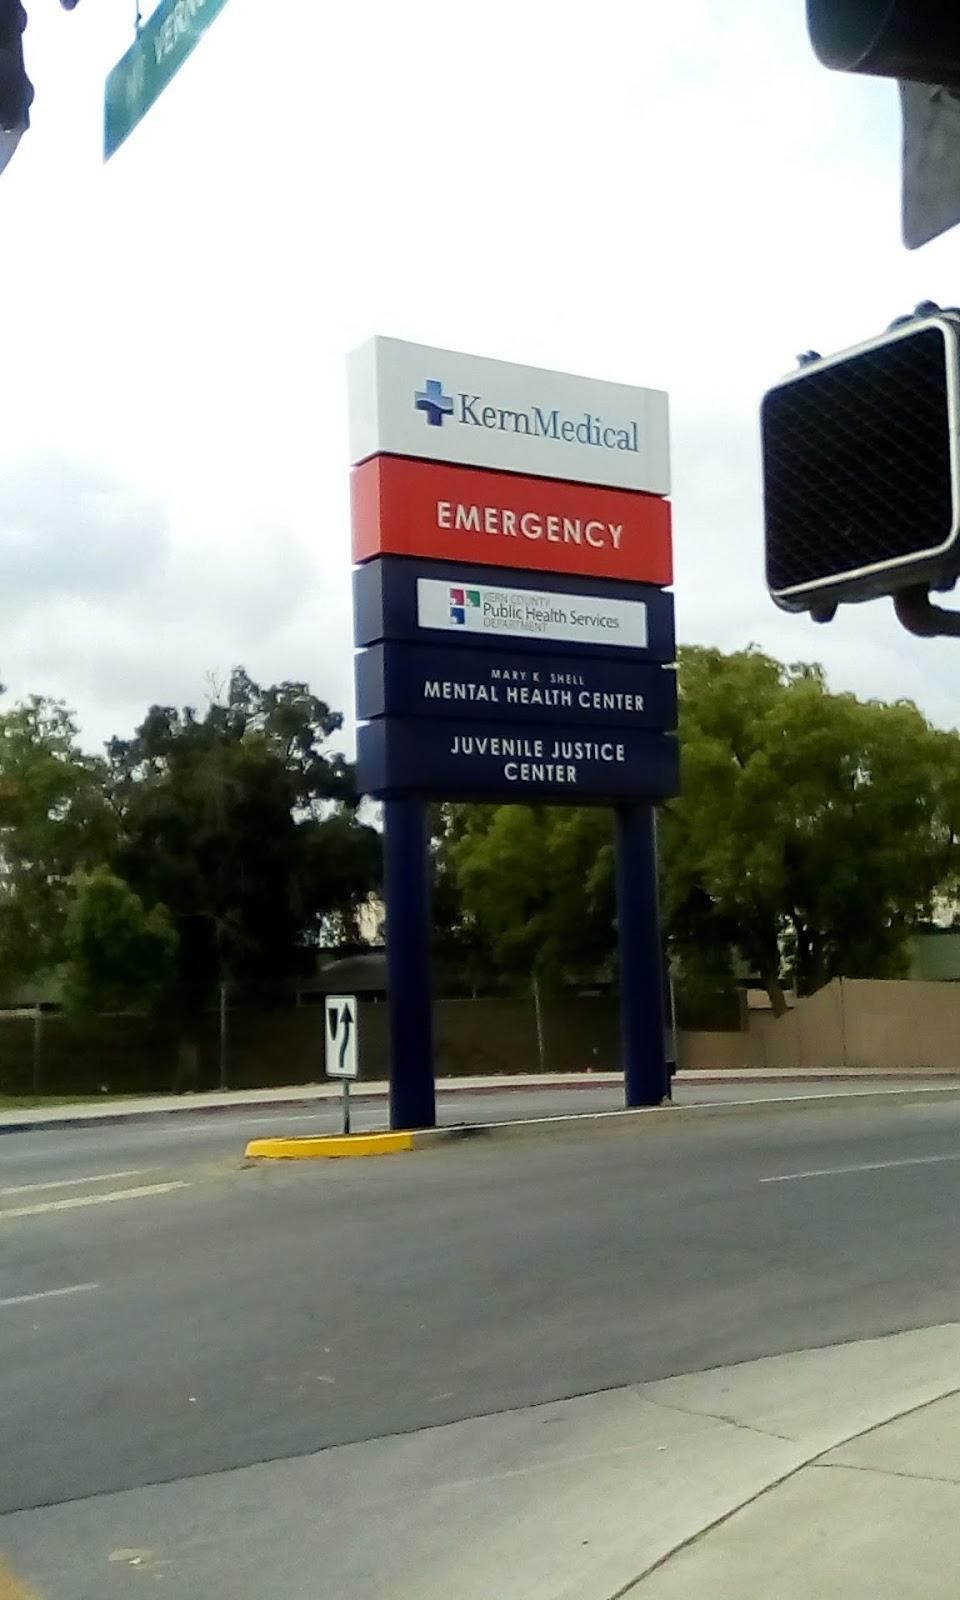 Kern Medical - hospital  | Photo 9 of 10 | Address: 1700 Mount Vernon Ave, Bakersfield, CA 93306, USA | Phone: (661) 326-2000